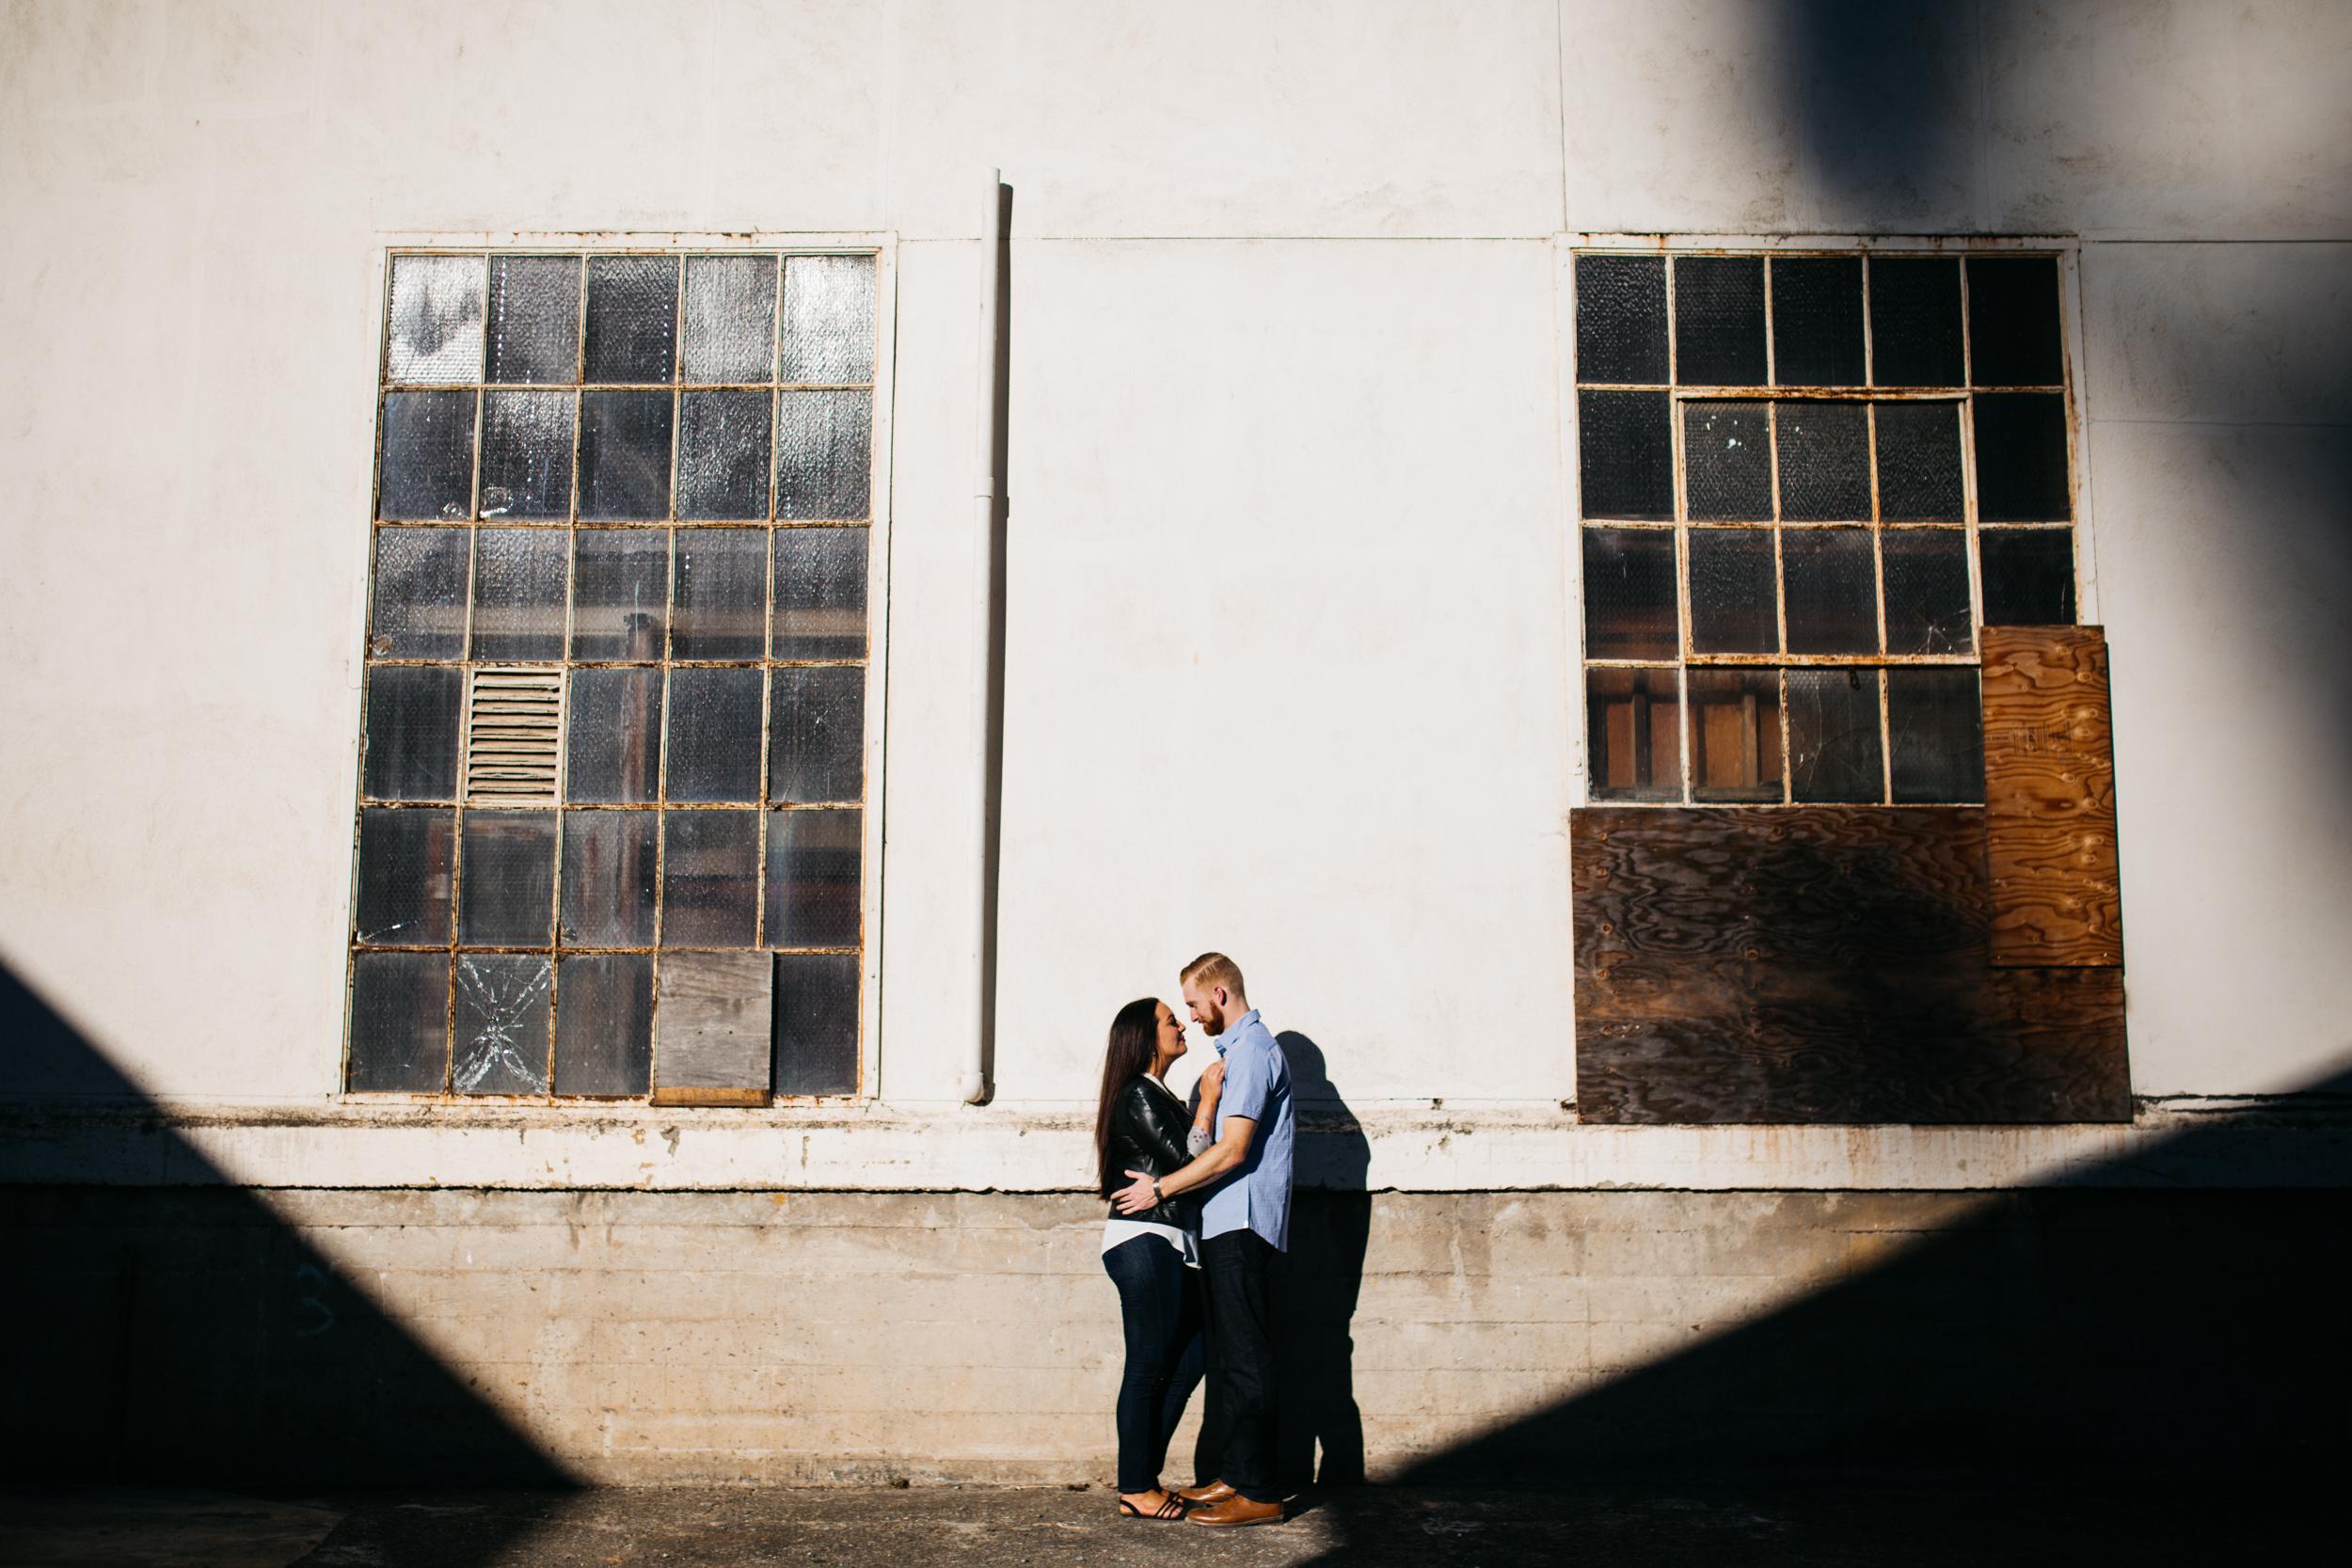 Engagement Photos-San Fransisco-Golden Gate Park-Ranalla Photo & Films-21.jpg